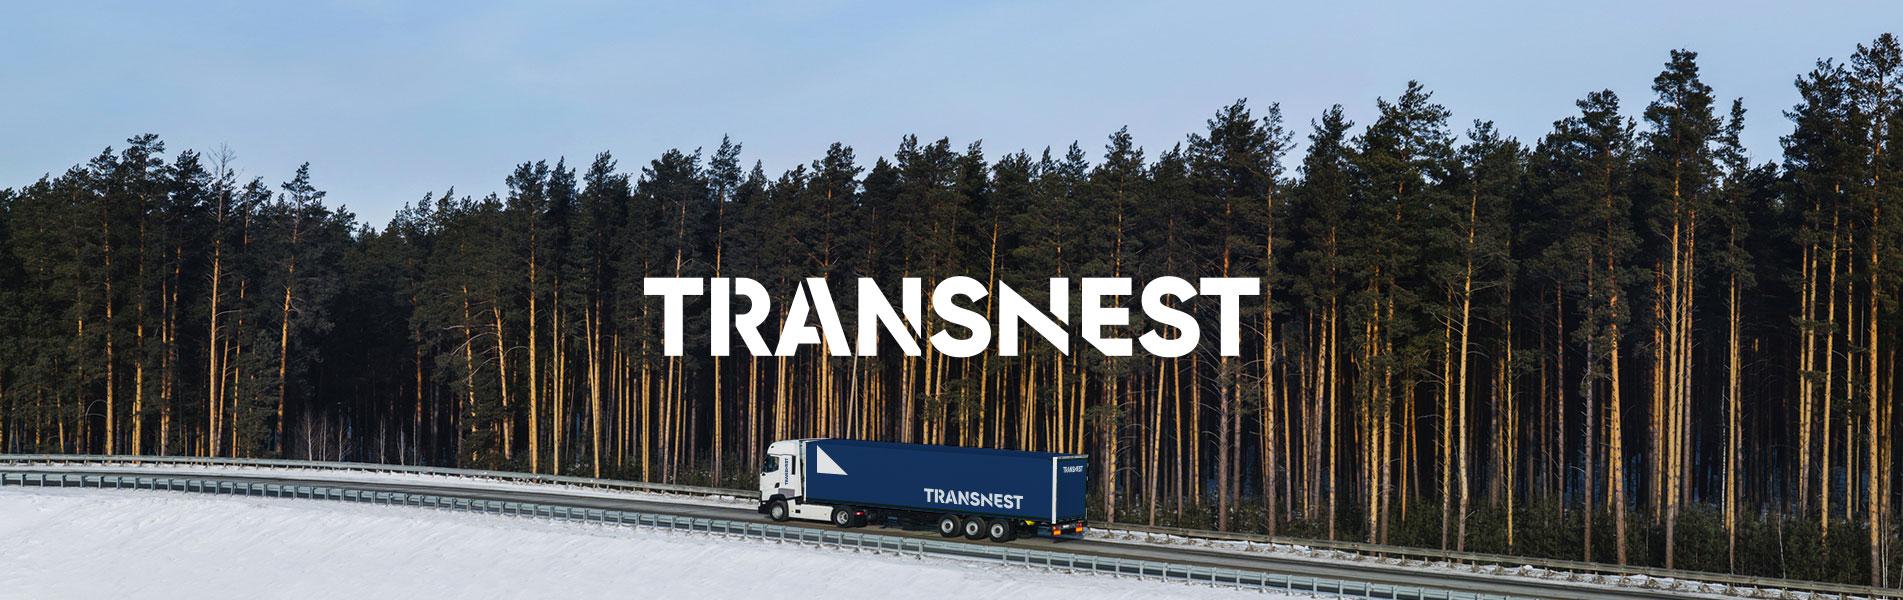 Transnest